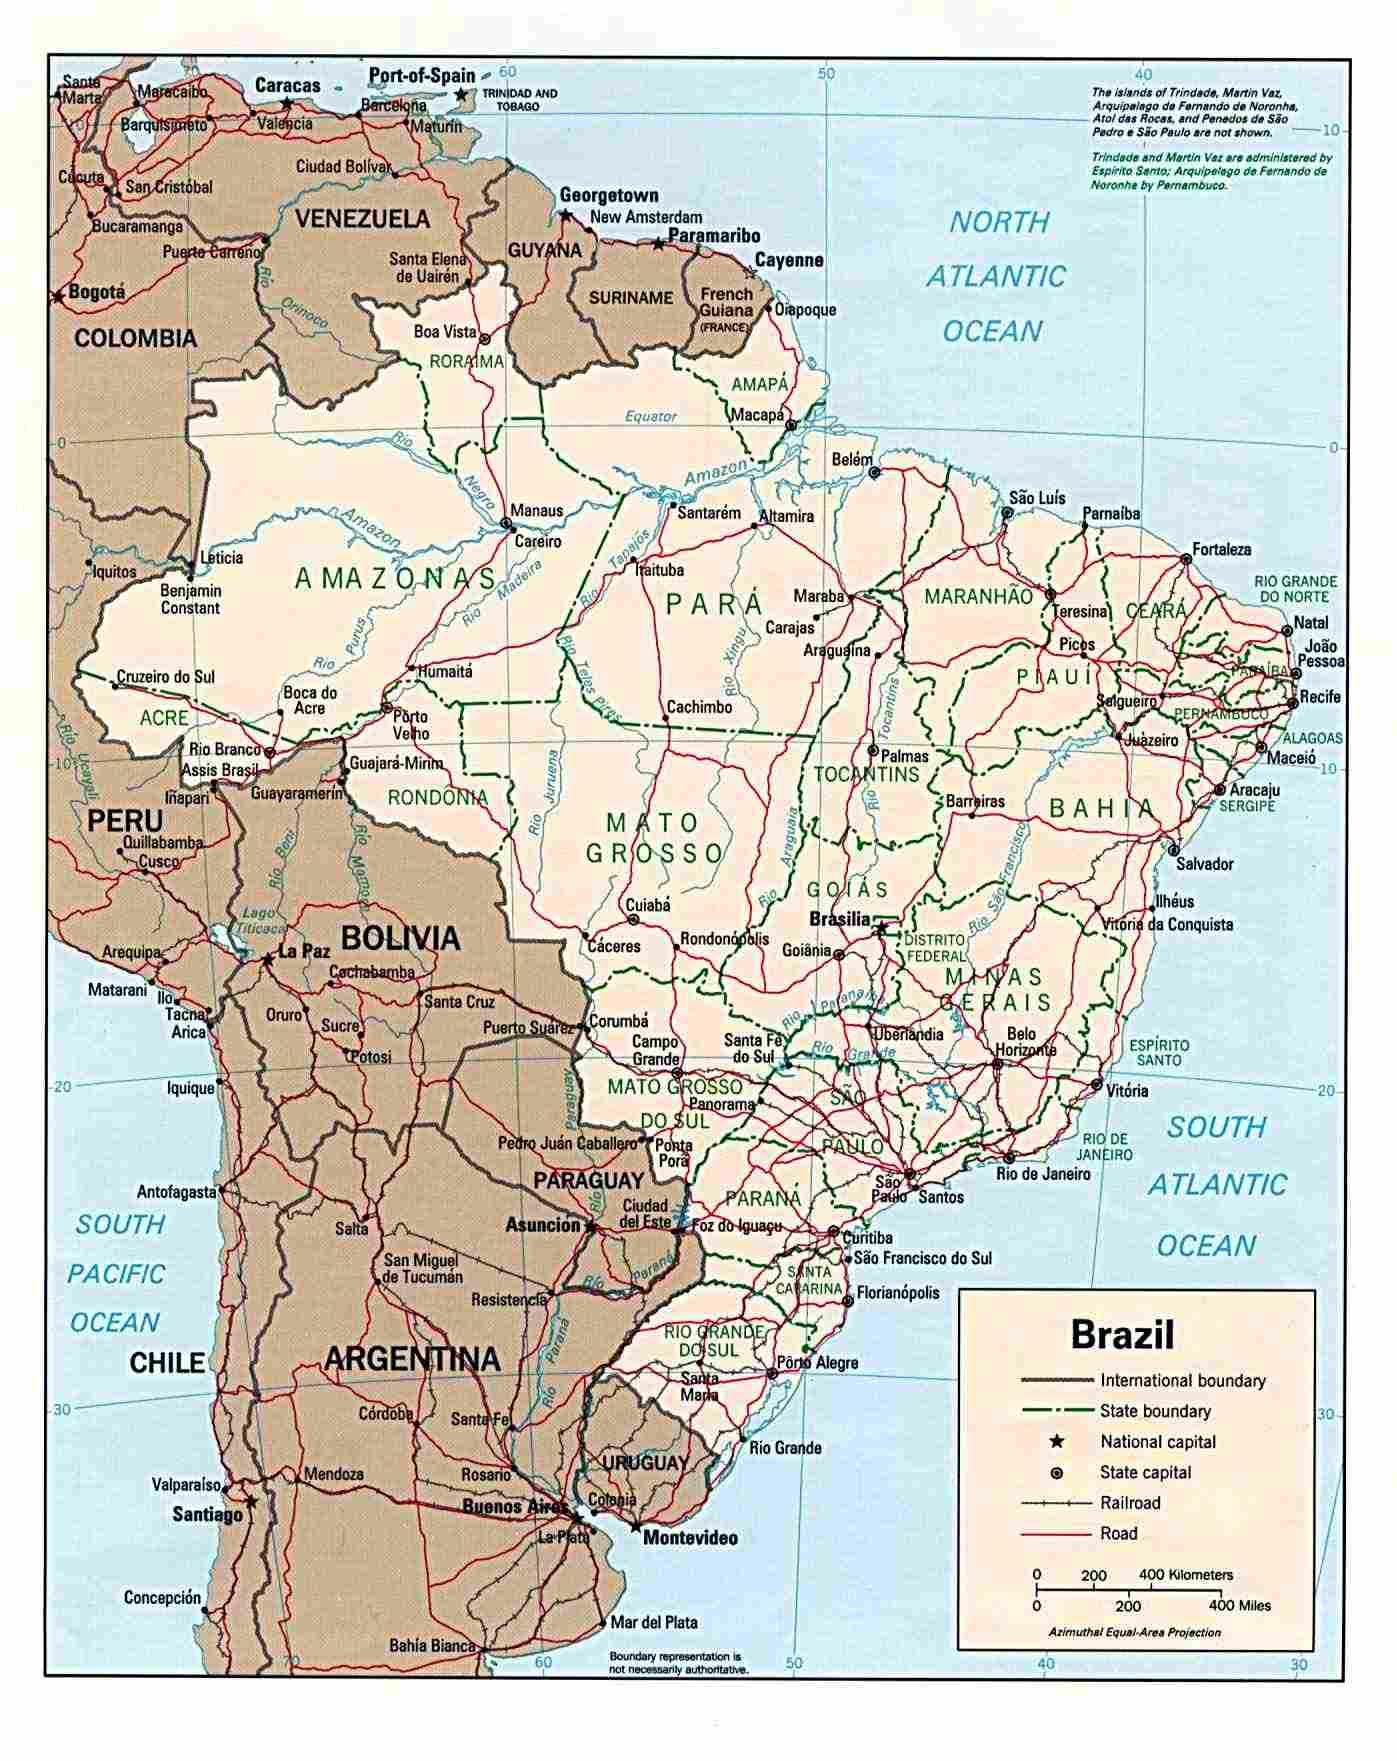 karte brasilien Karten von Brasilien | Karten von Brasilien zum Herunterladen und  karte brasilien